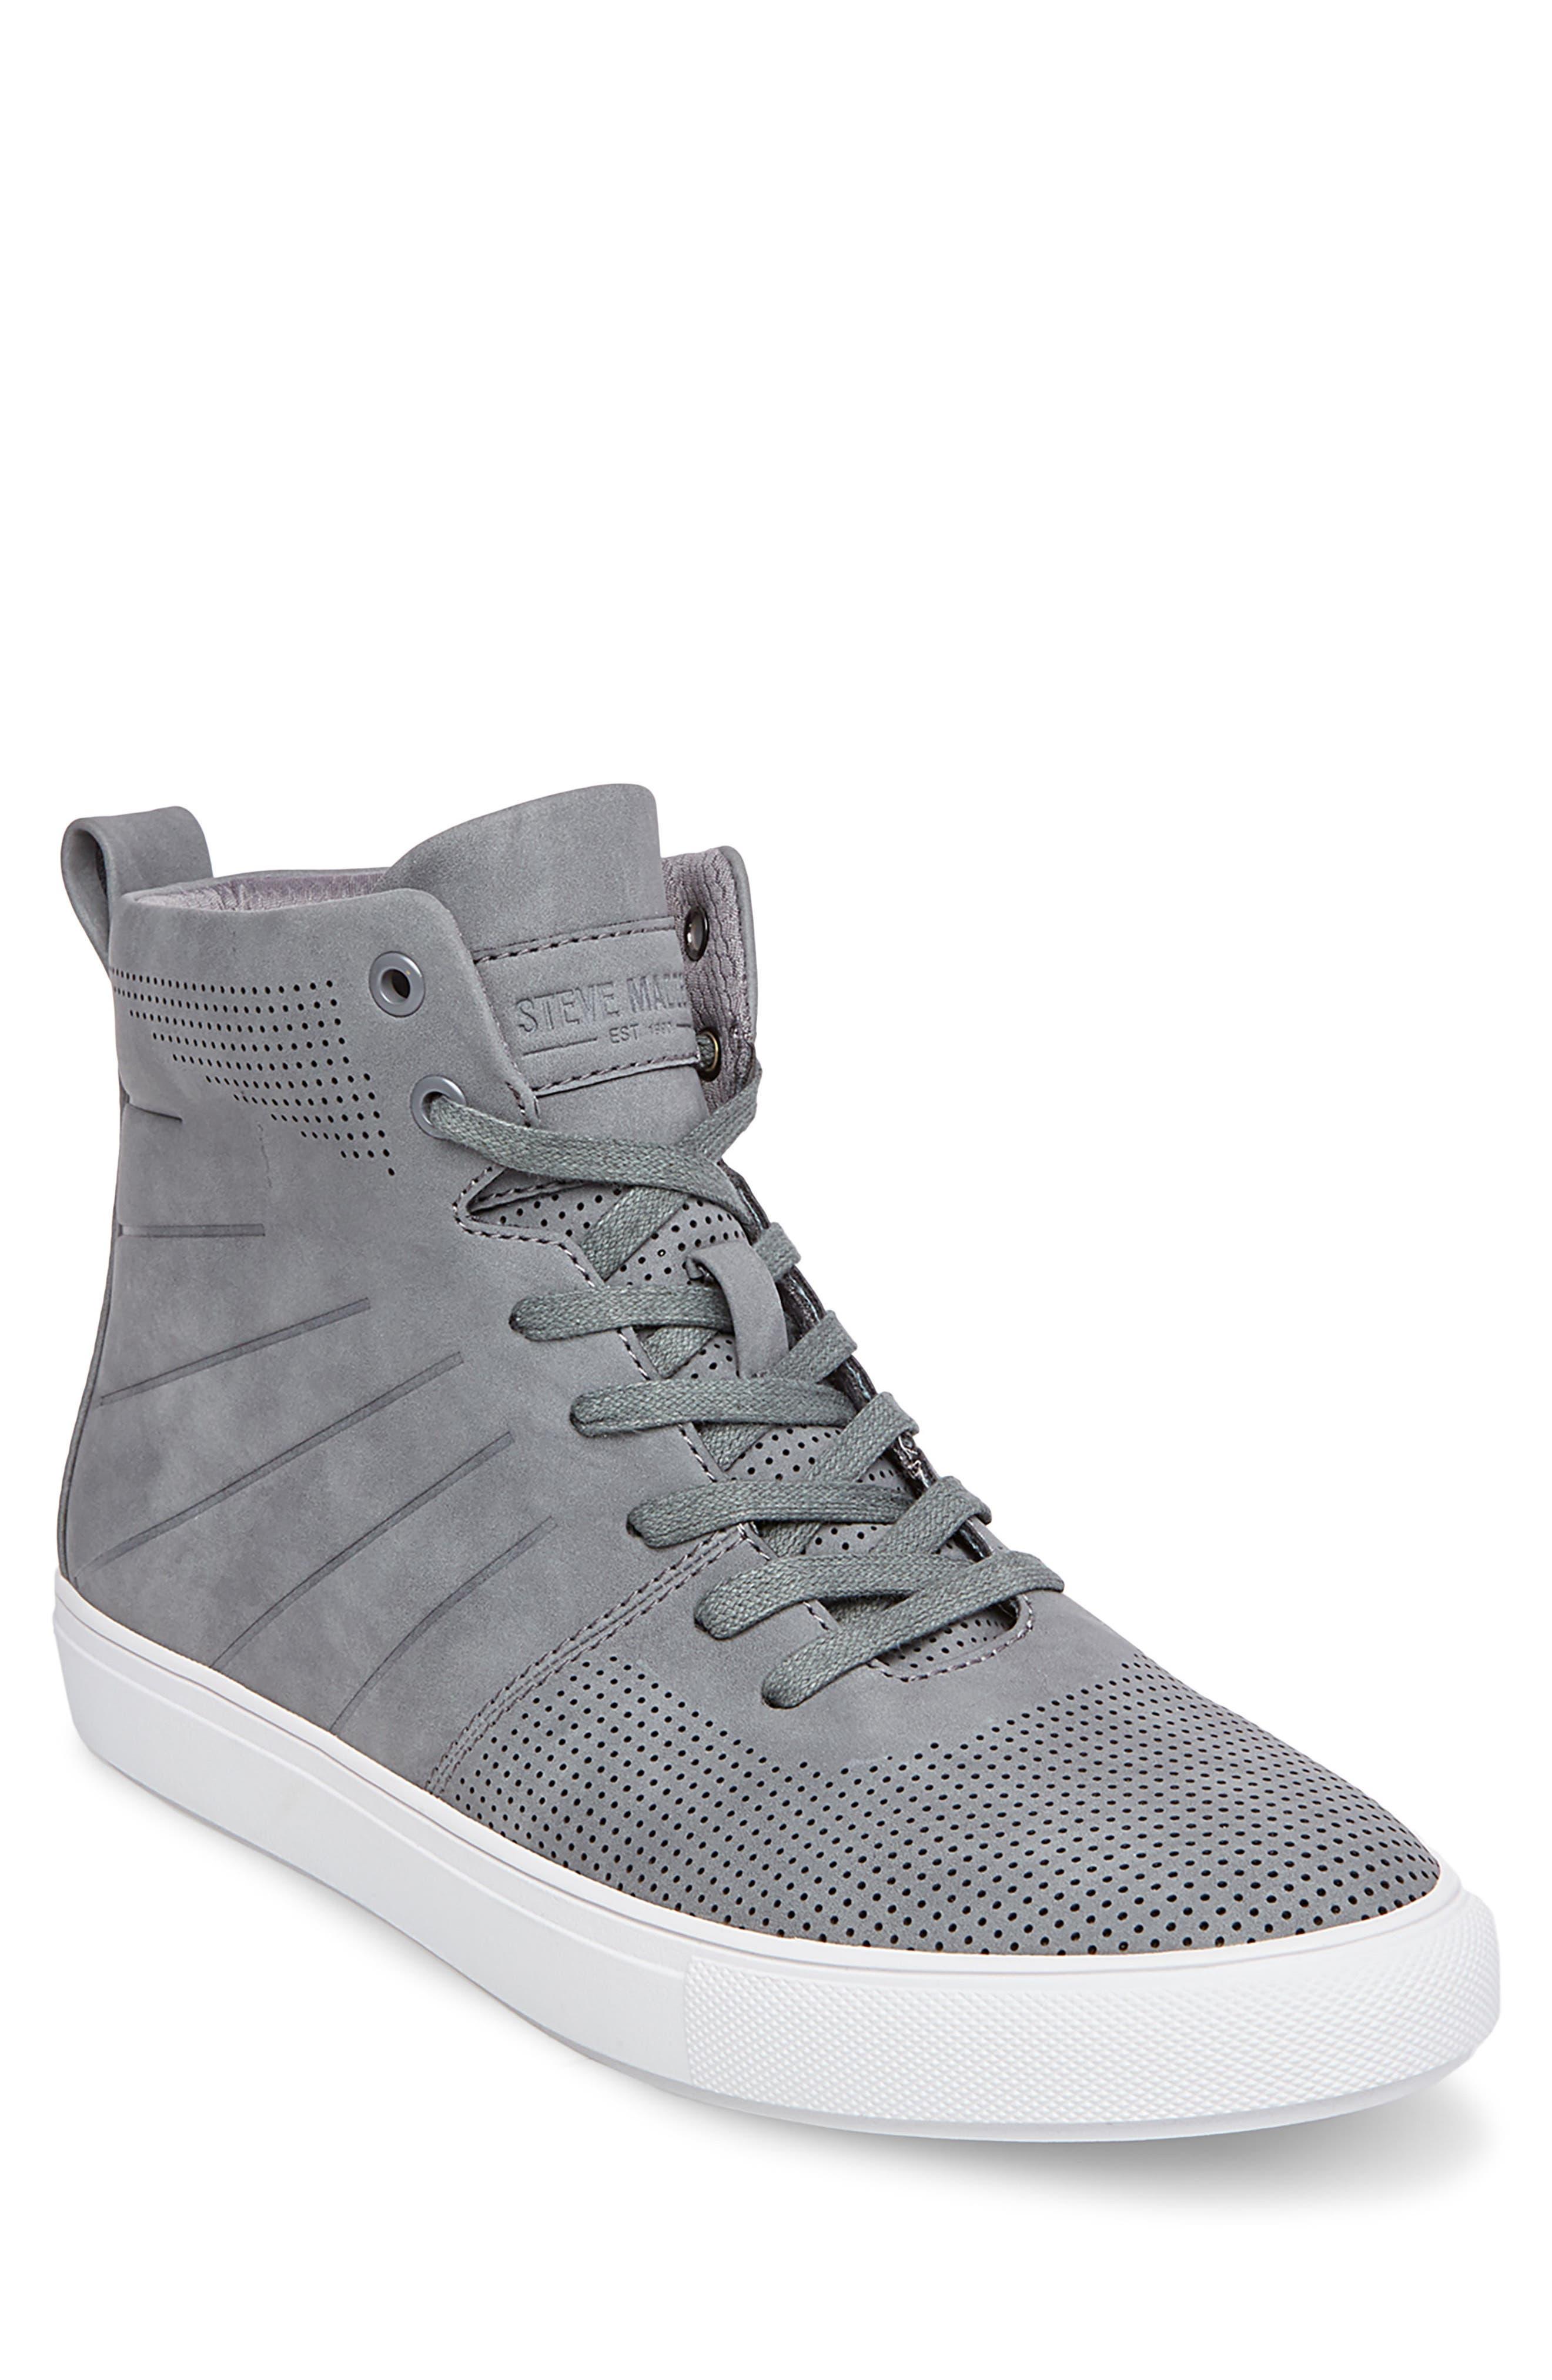 Eskape Sneaker,                             Main thumbnail 1, color,                             Grey